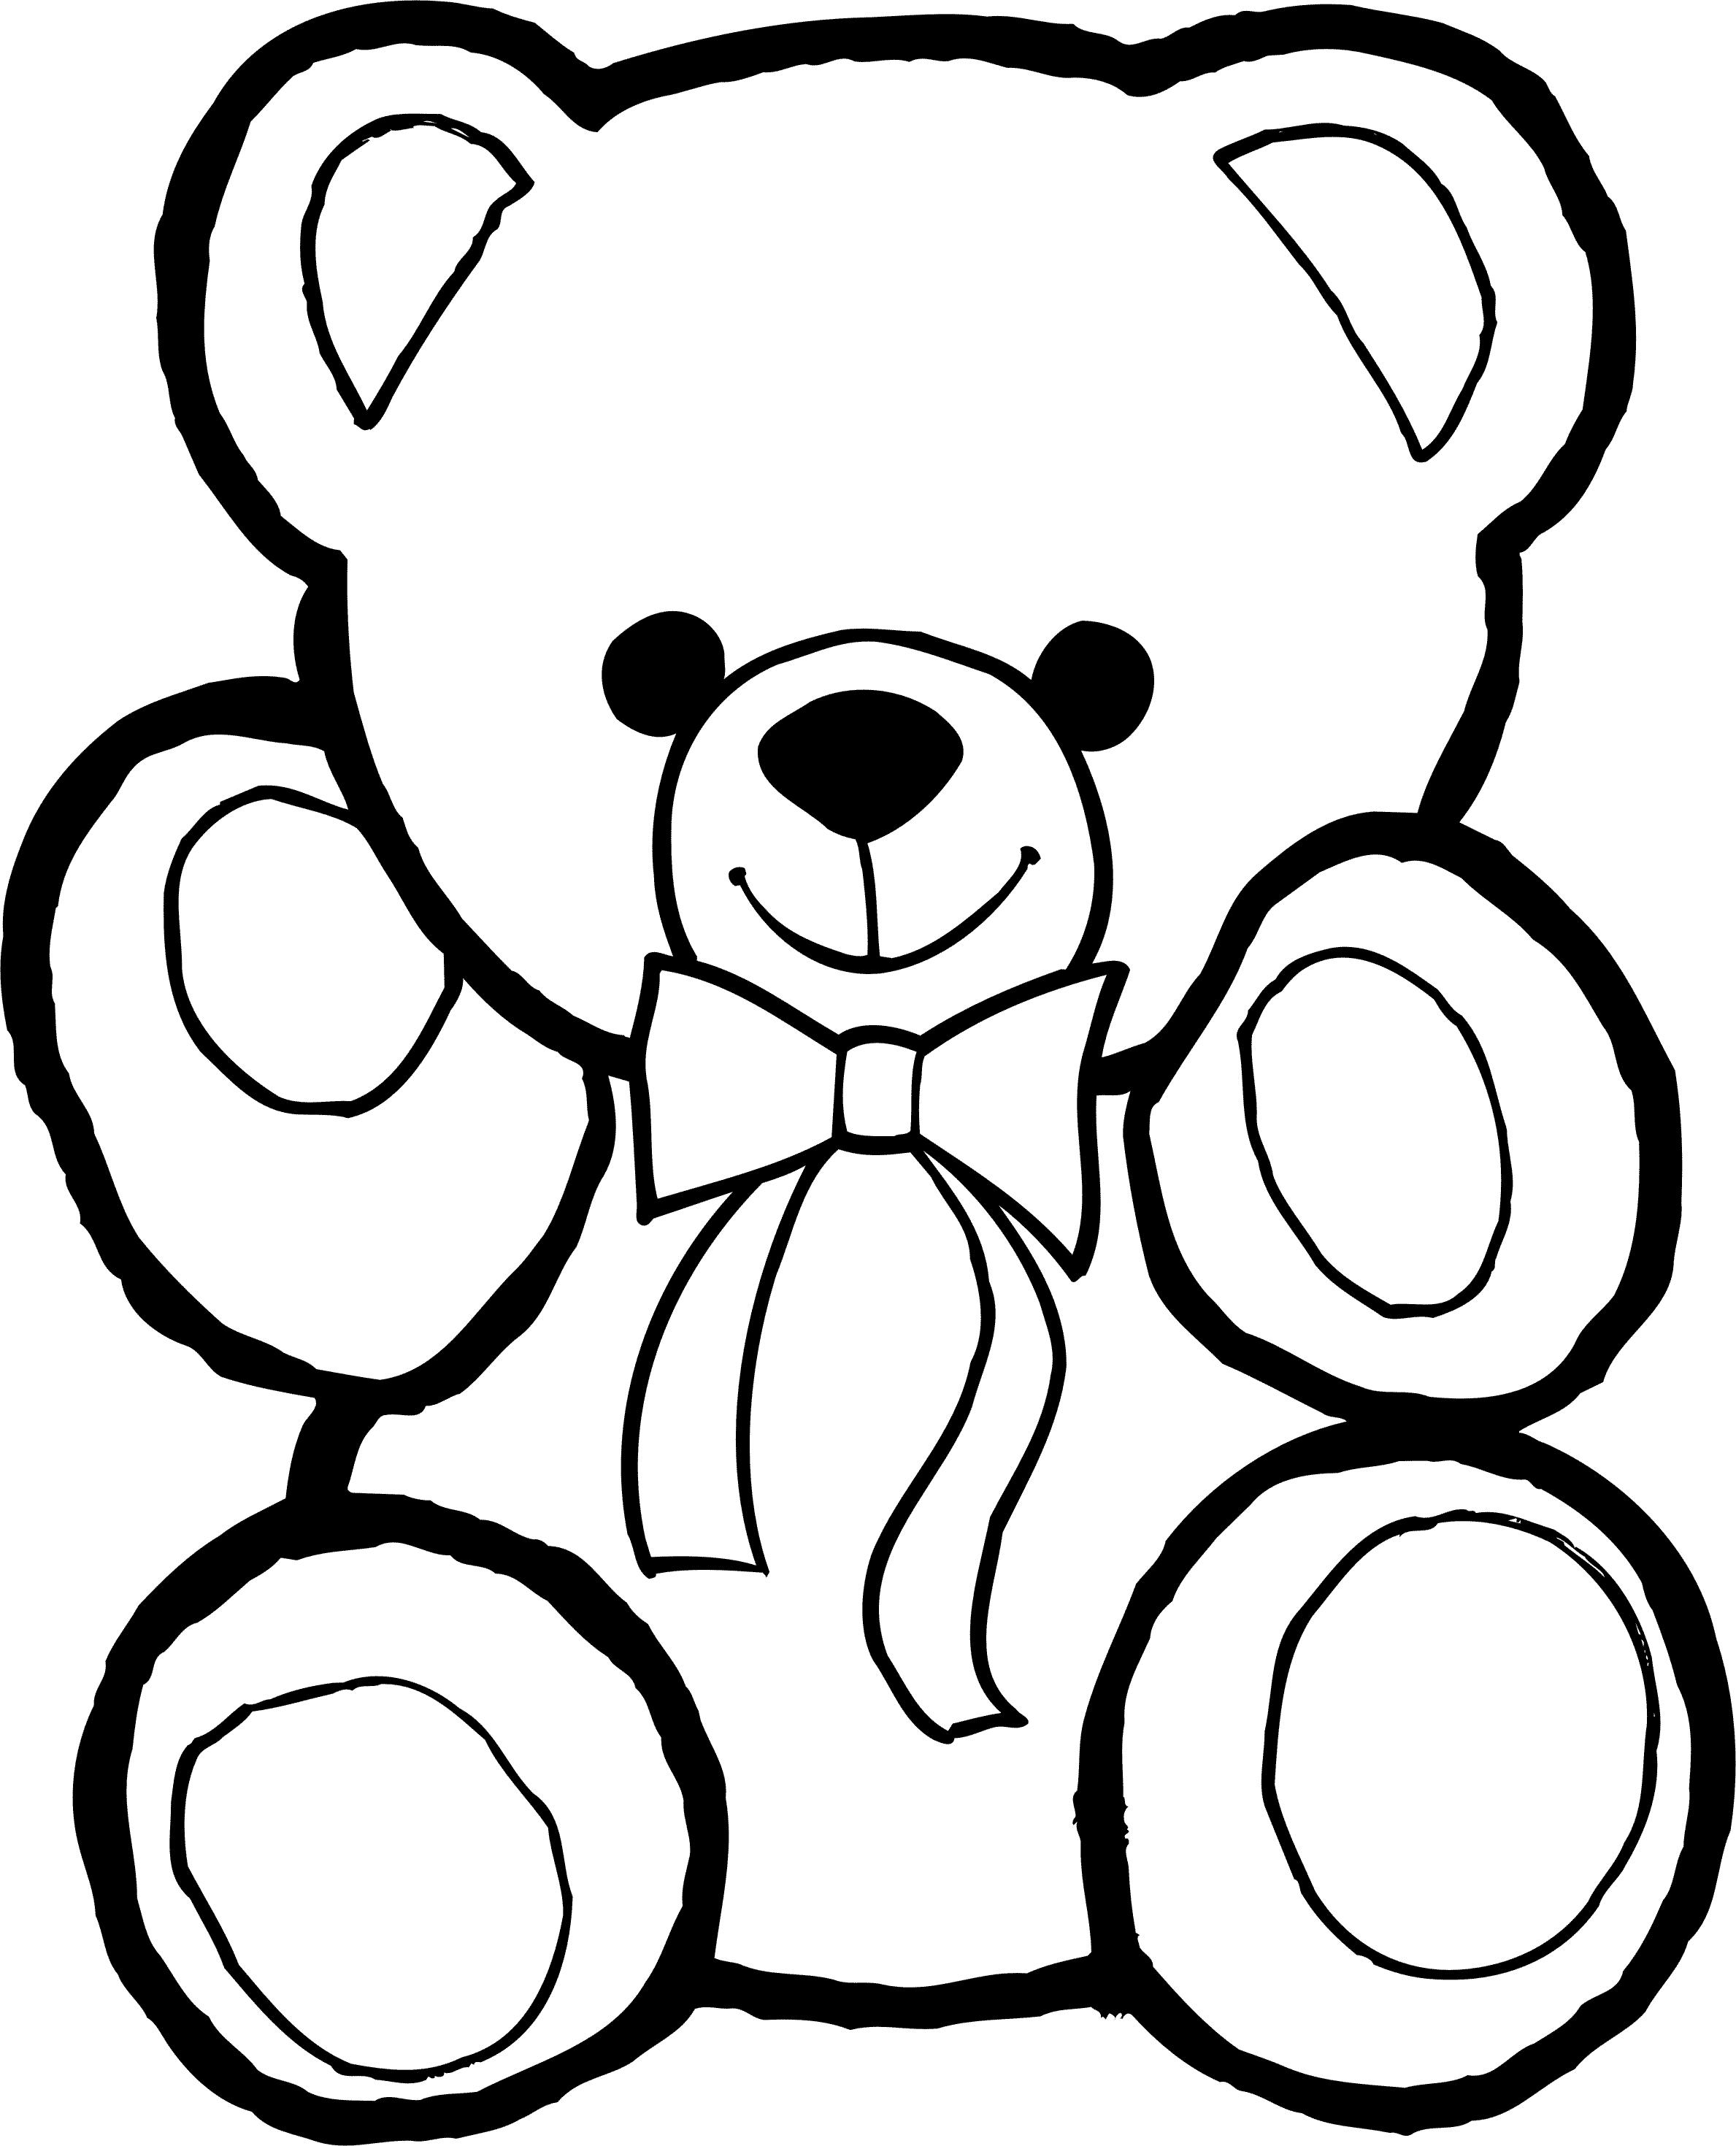 Картинки по запросу мишка игрушка рисунок | Раскраски ...